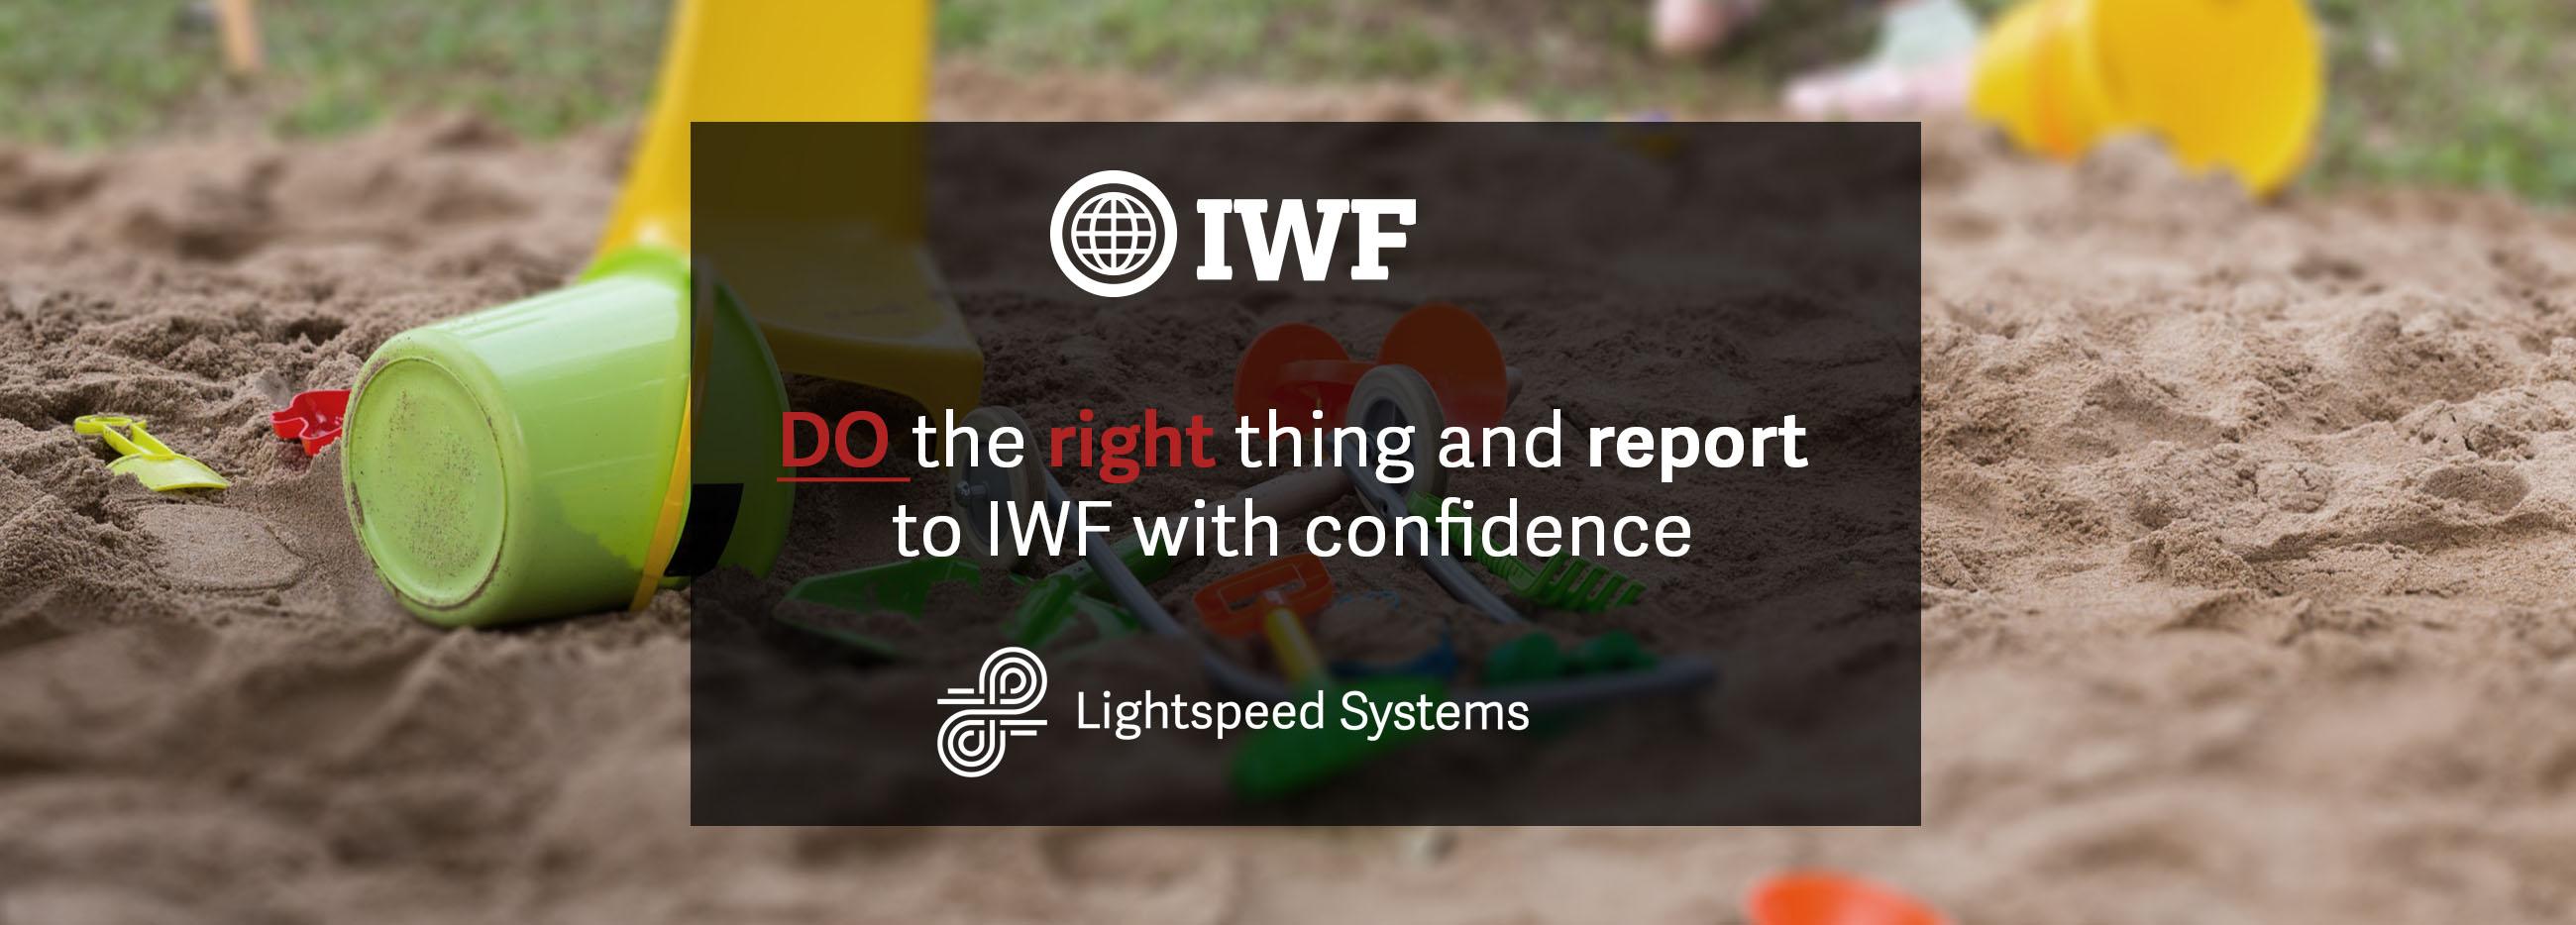 IWF Banner vr11